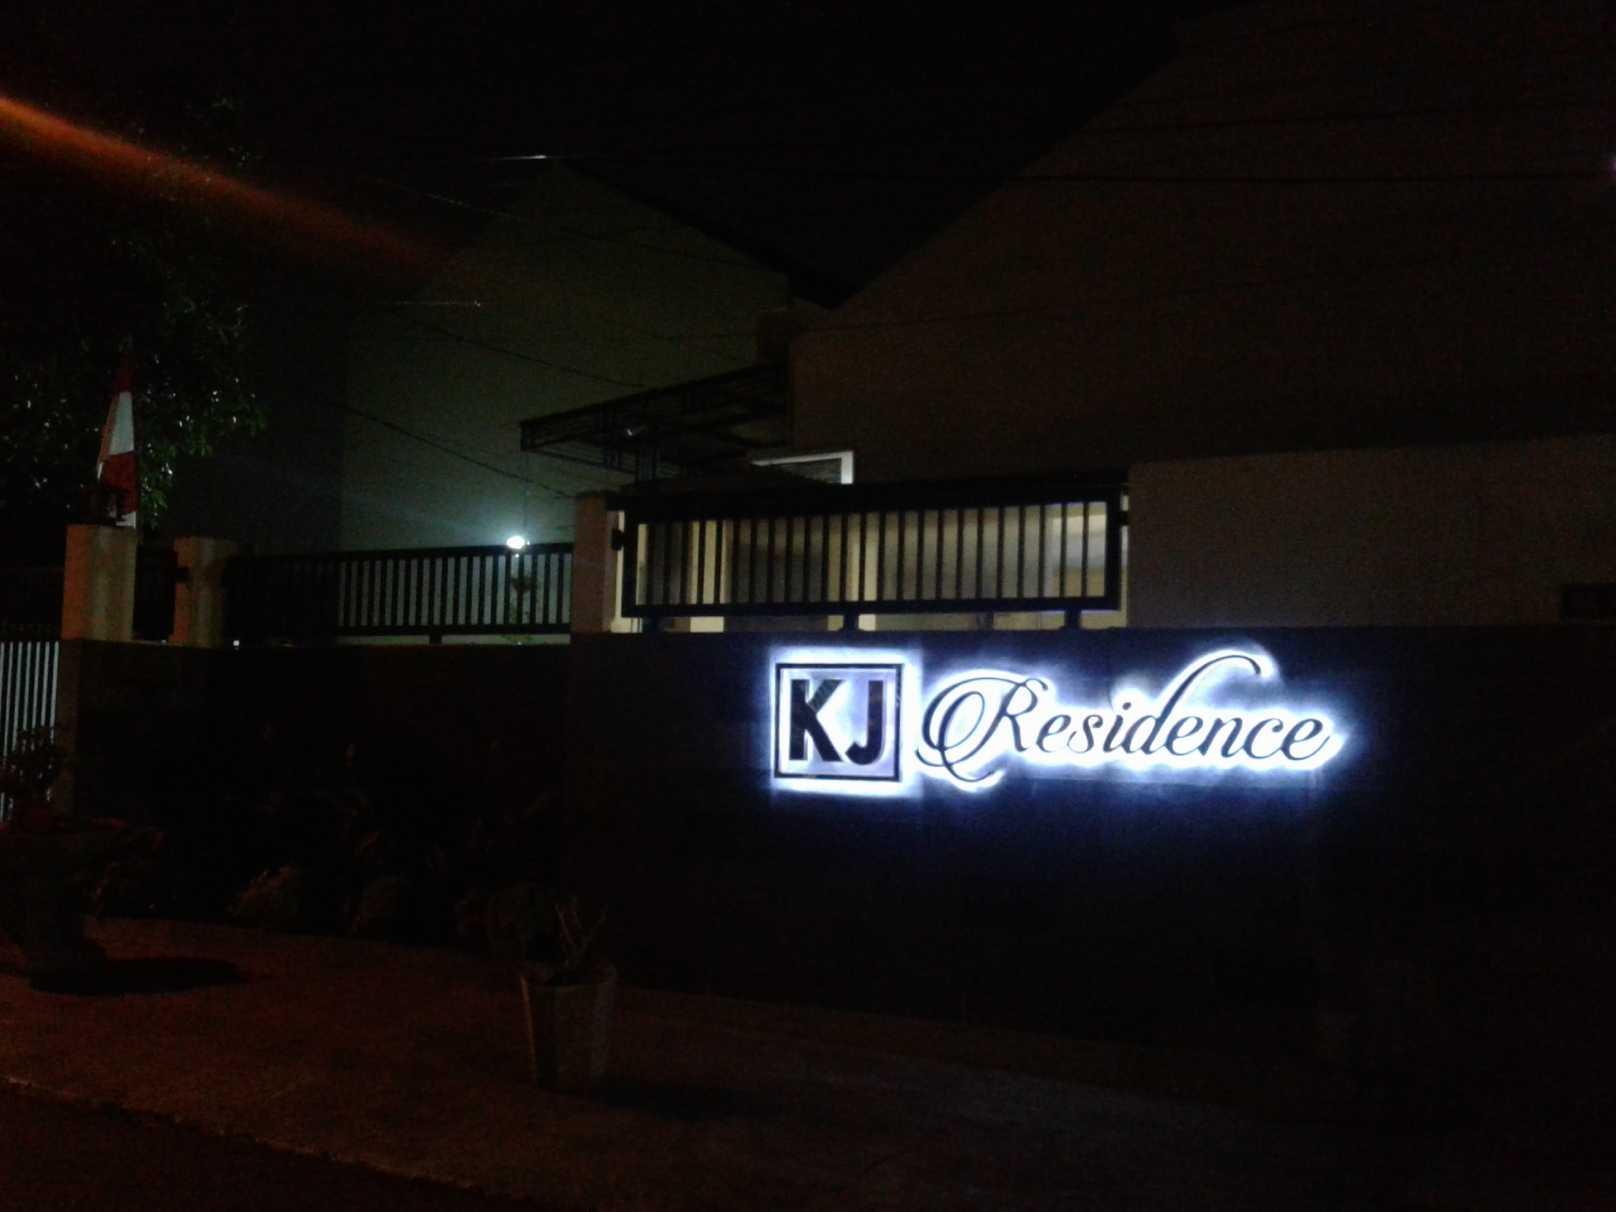 Mki Kj Residence  Jakarta, Indonesia Jakarta, Indonesia Main Gate At Night Modern  17097